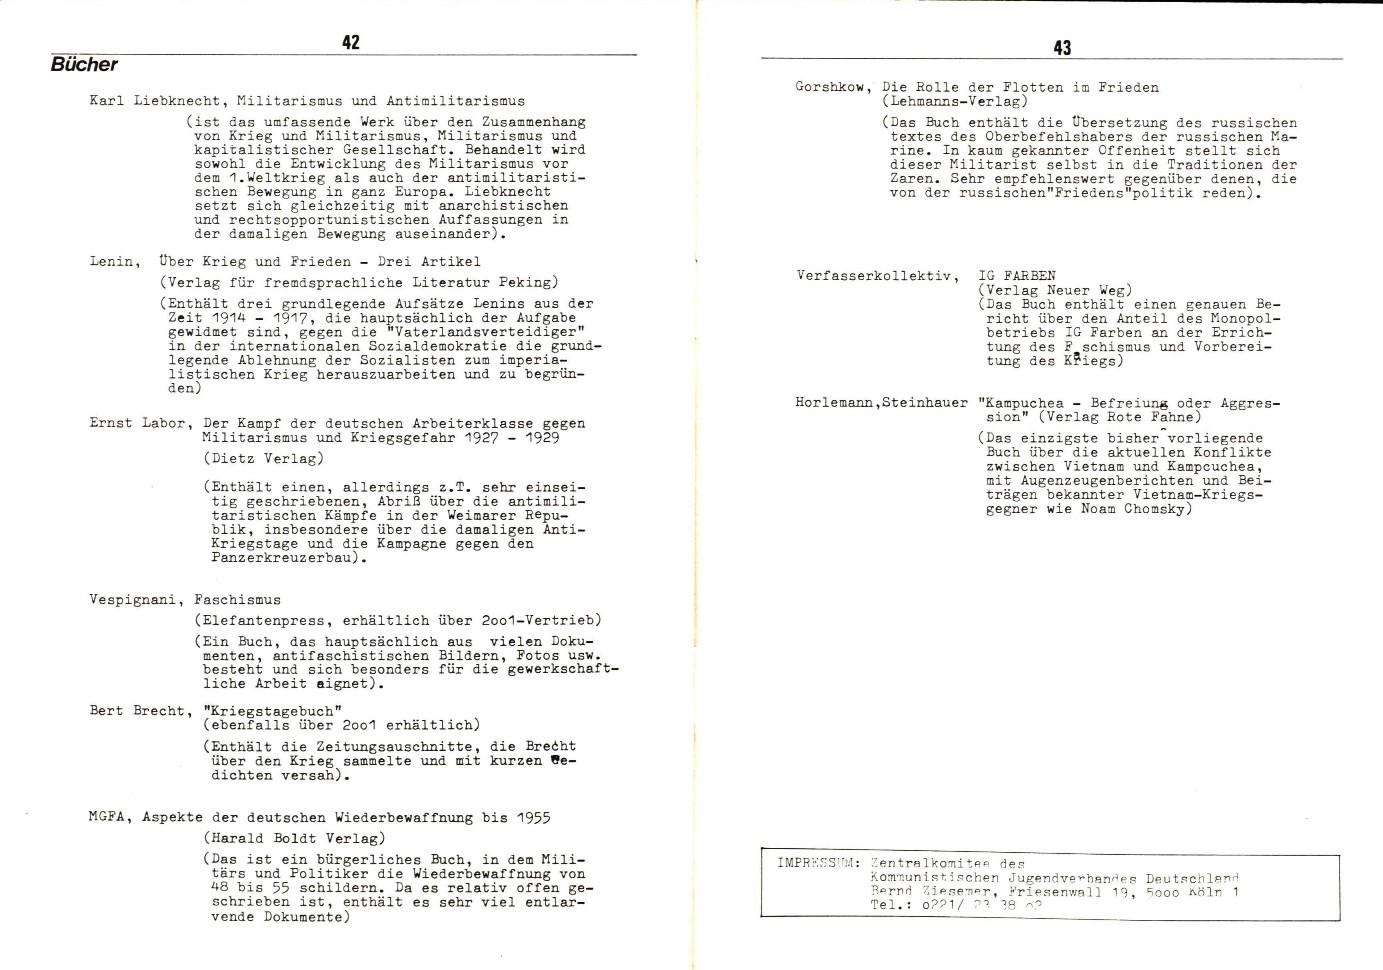 KJVD_1979_Dokumente_zum_Antikriegstag_25